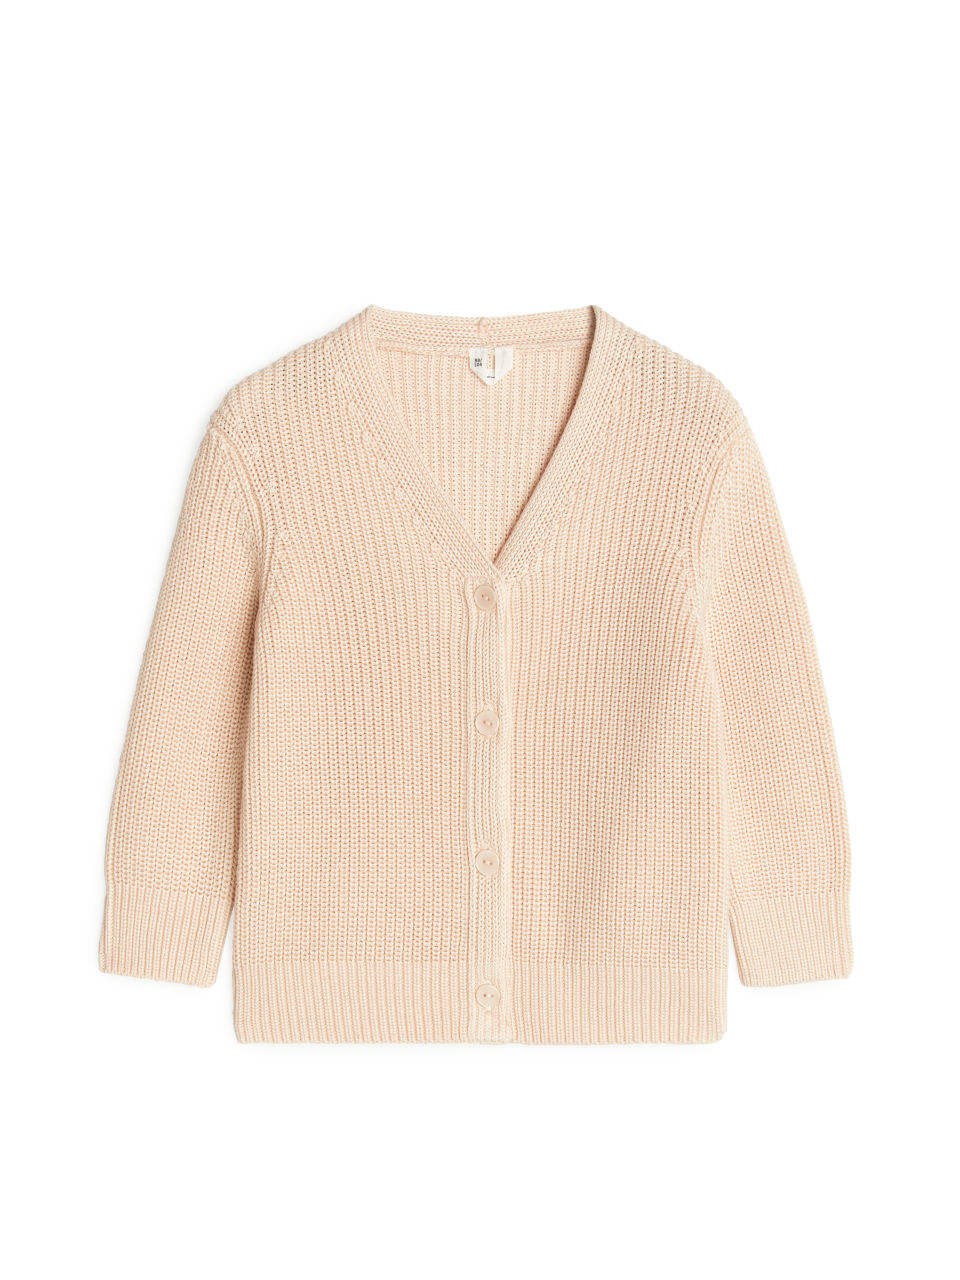 Pima Cotton Cardigan - Beige